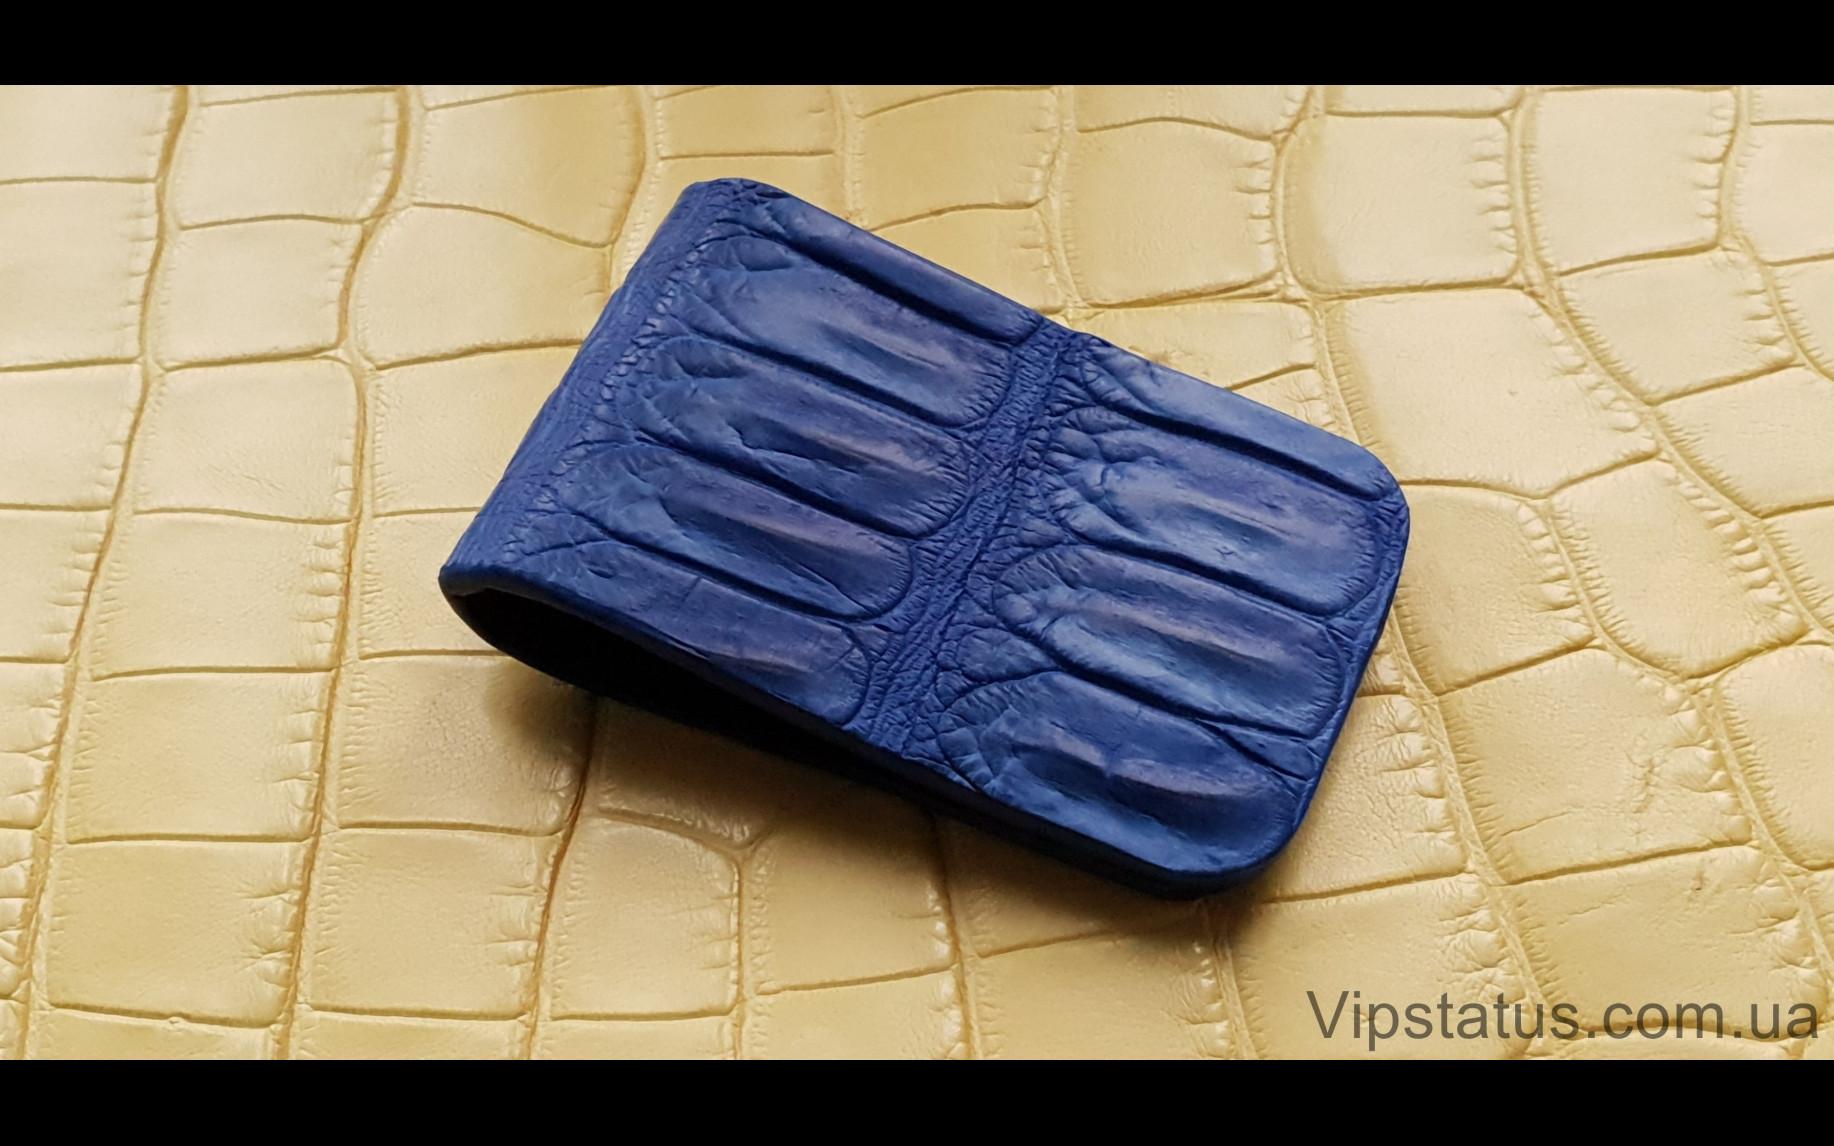 Elite Dark Blue Crocodile Вип зажим для купюр Dark Blue Crocodile Vip bill clip image 1